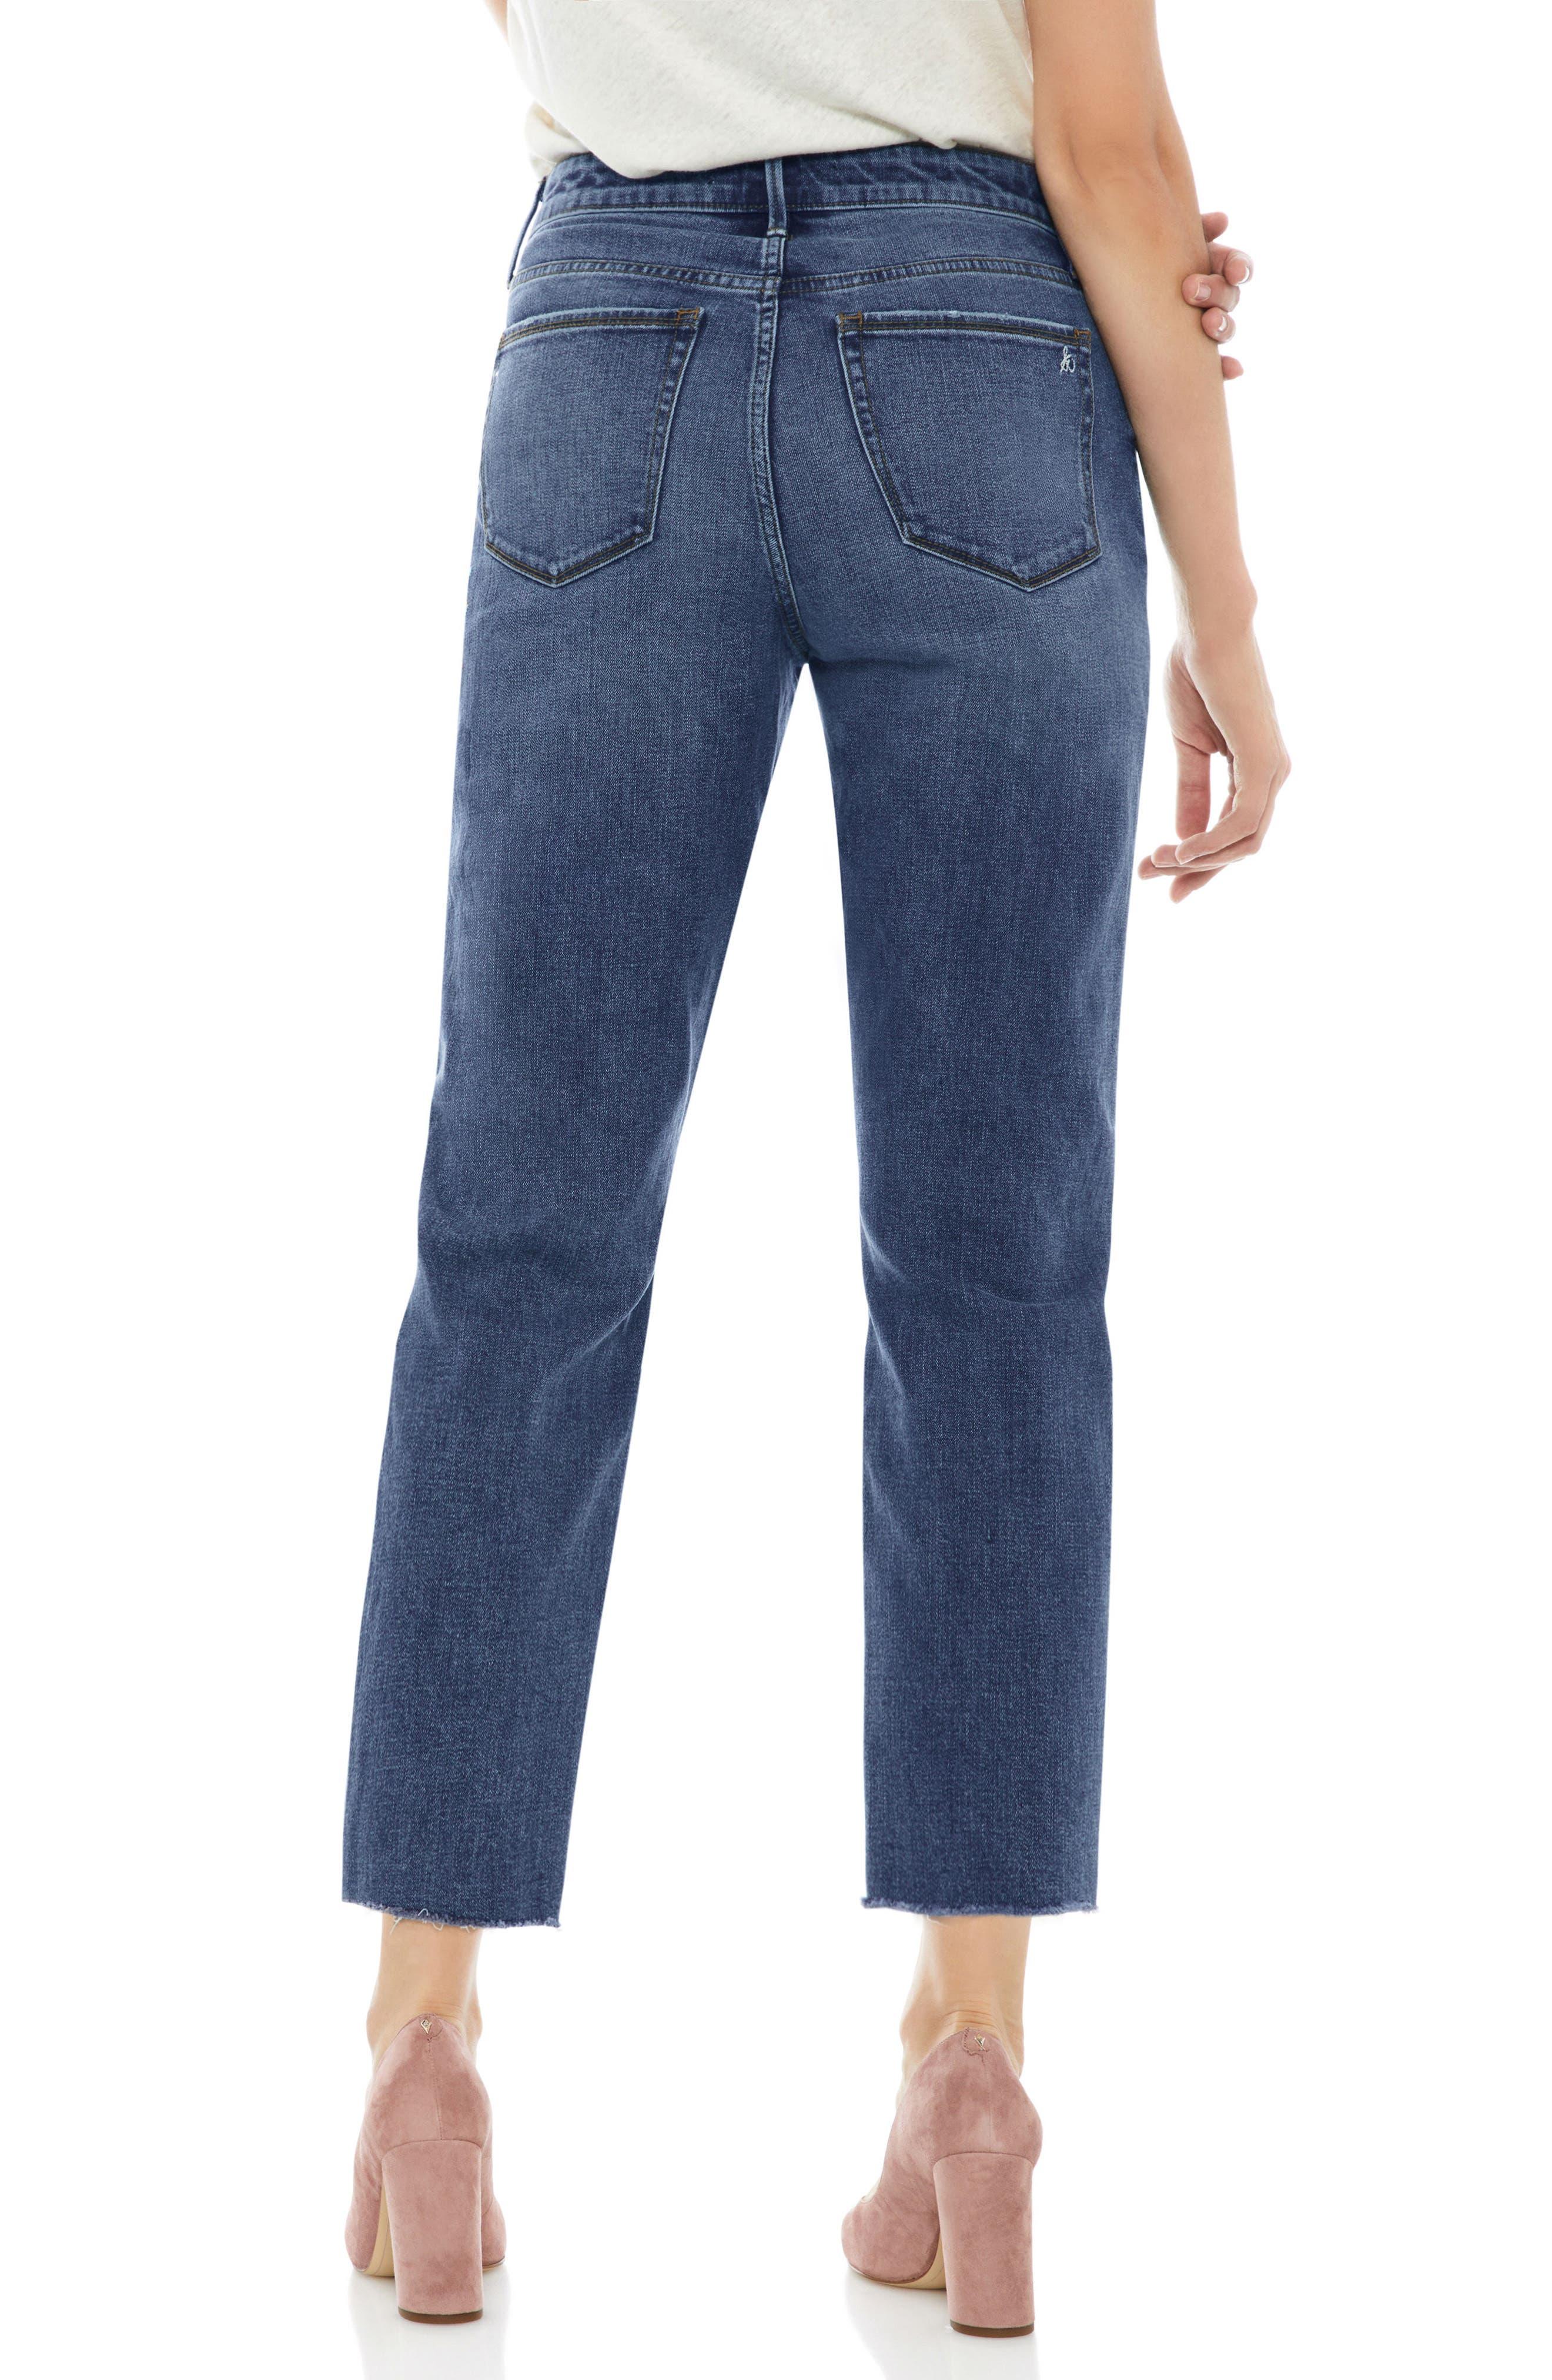 SAM EDELMAN,                             The Mary Jane Floral Accent Step Hem Jeans,                             Alternate thumbnail 2, color,                             420